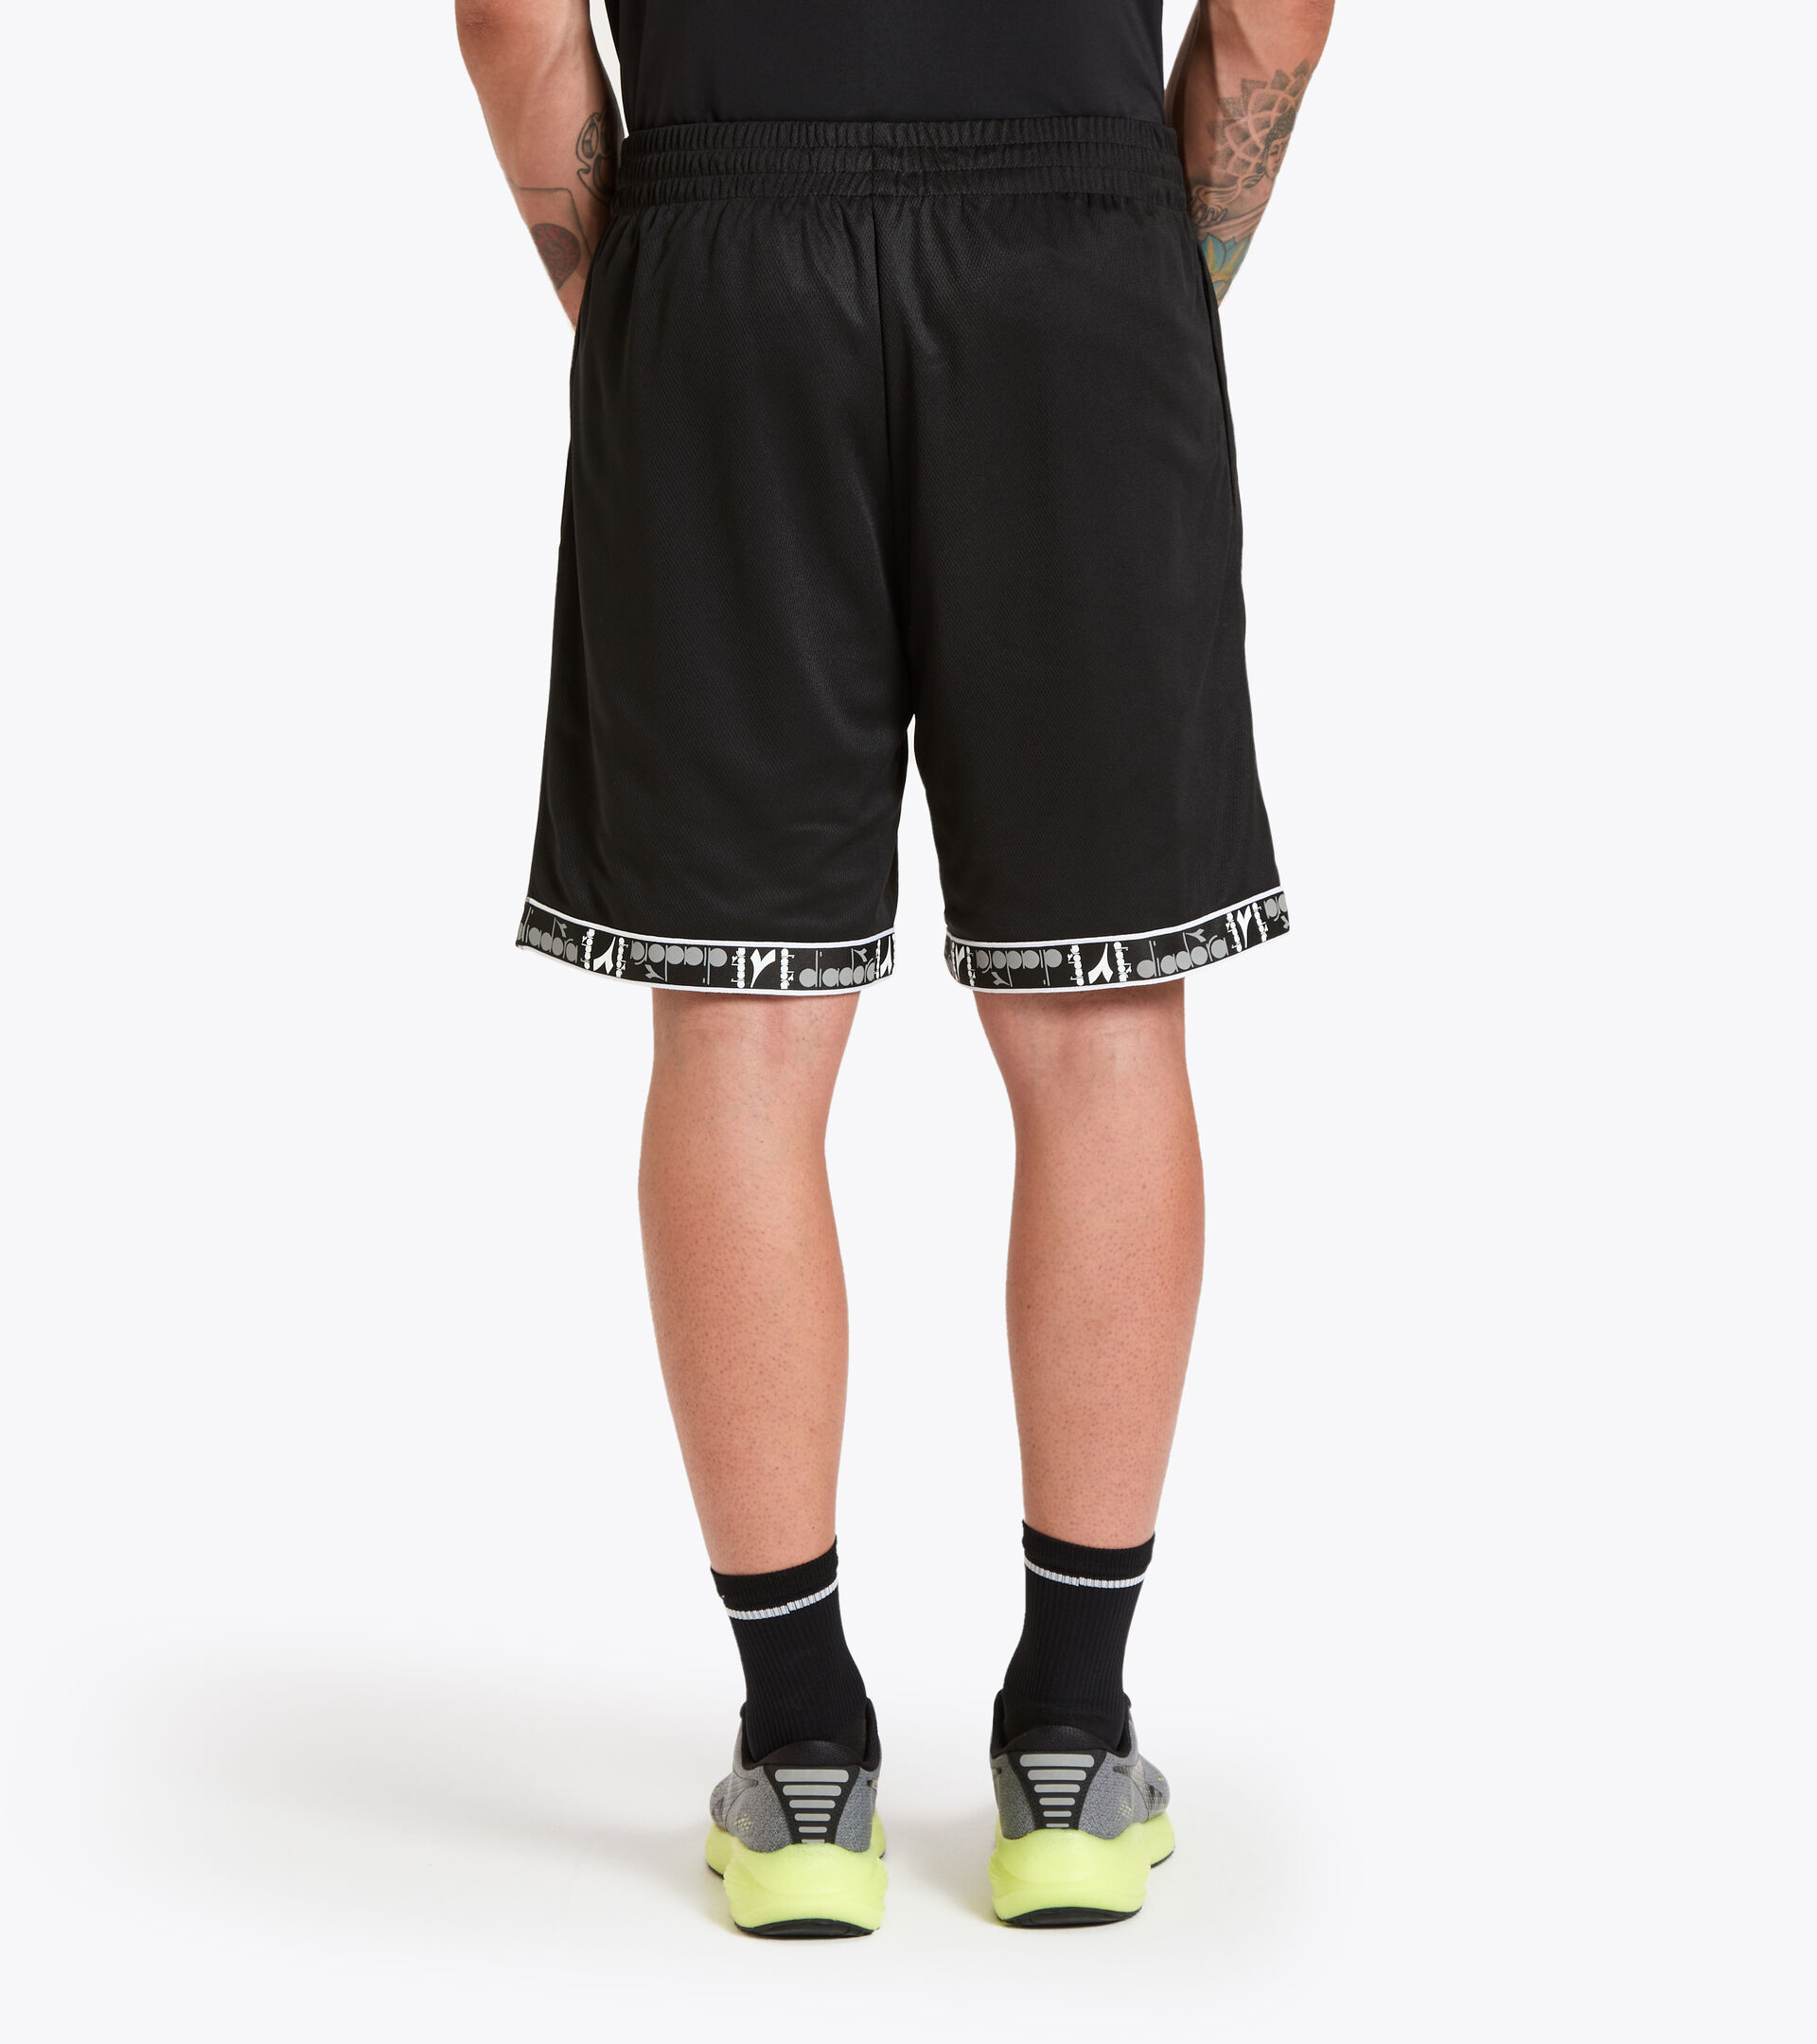 Men's reversible Bermuda workout shorts BERMUDA REVERSIBLE BUDDYFIT BLACK - Diadora